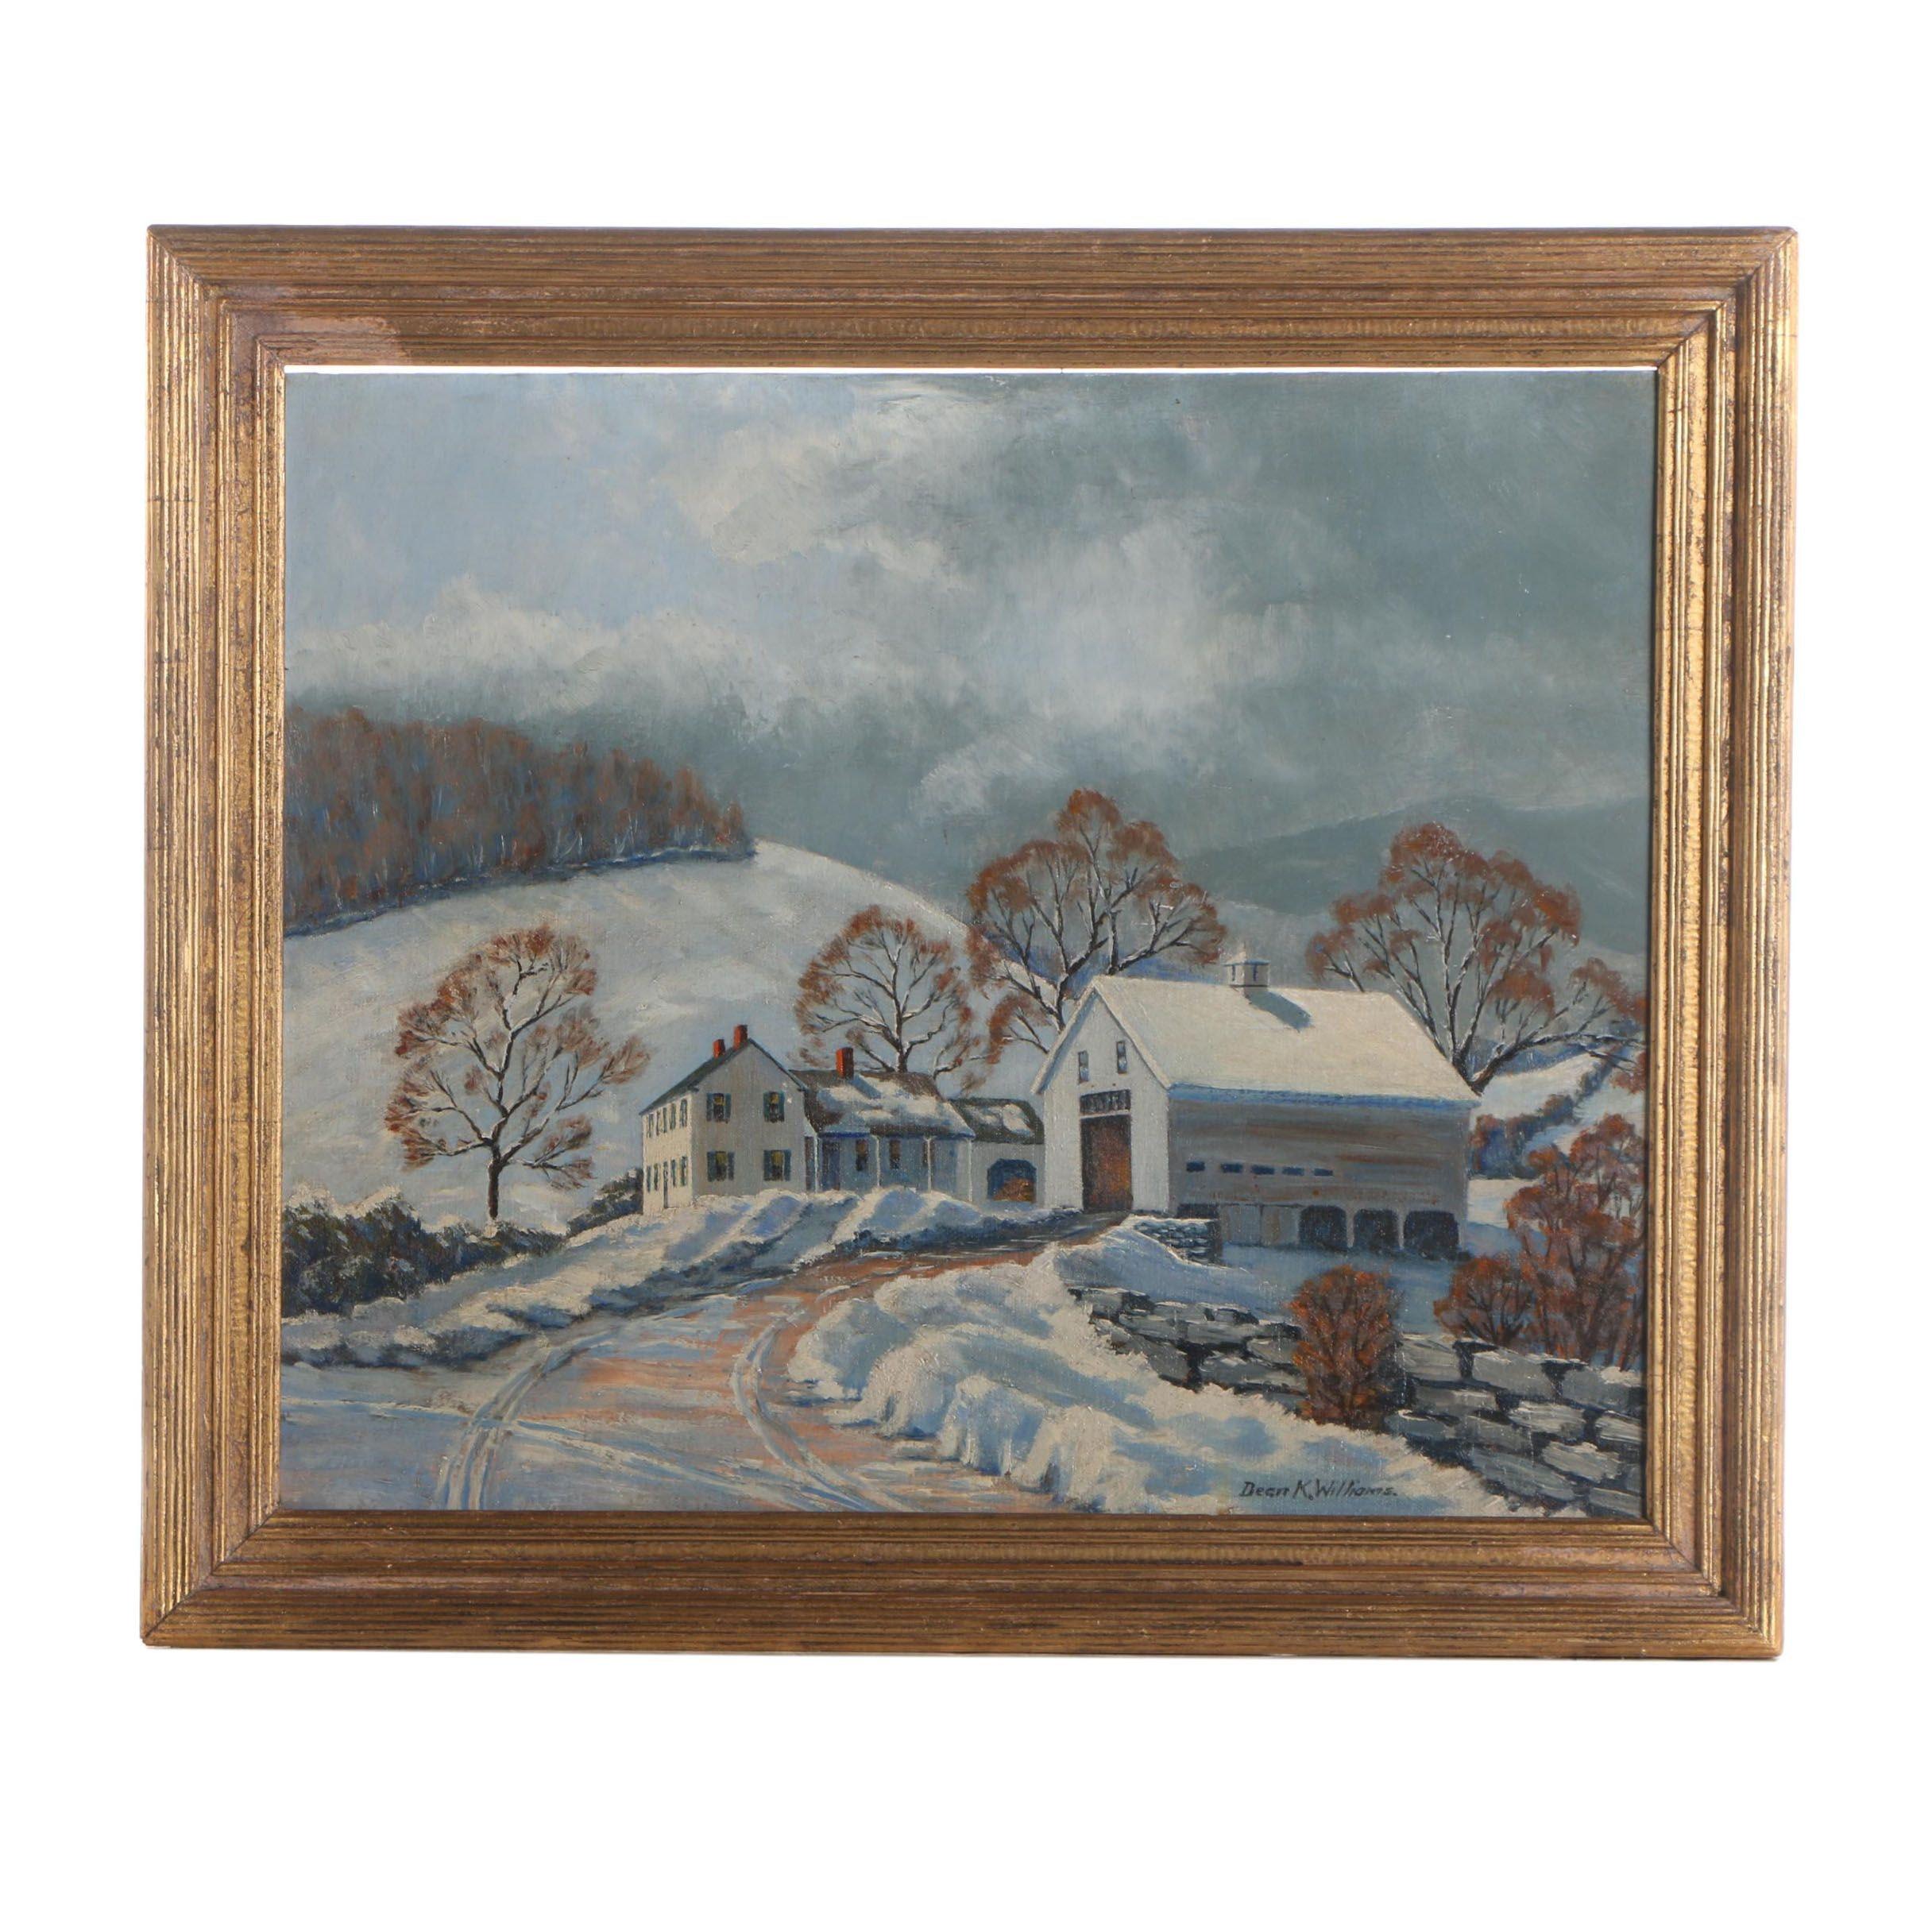 Dean K. Williams Oil Painting